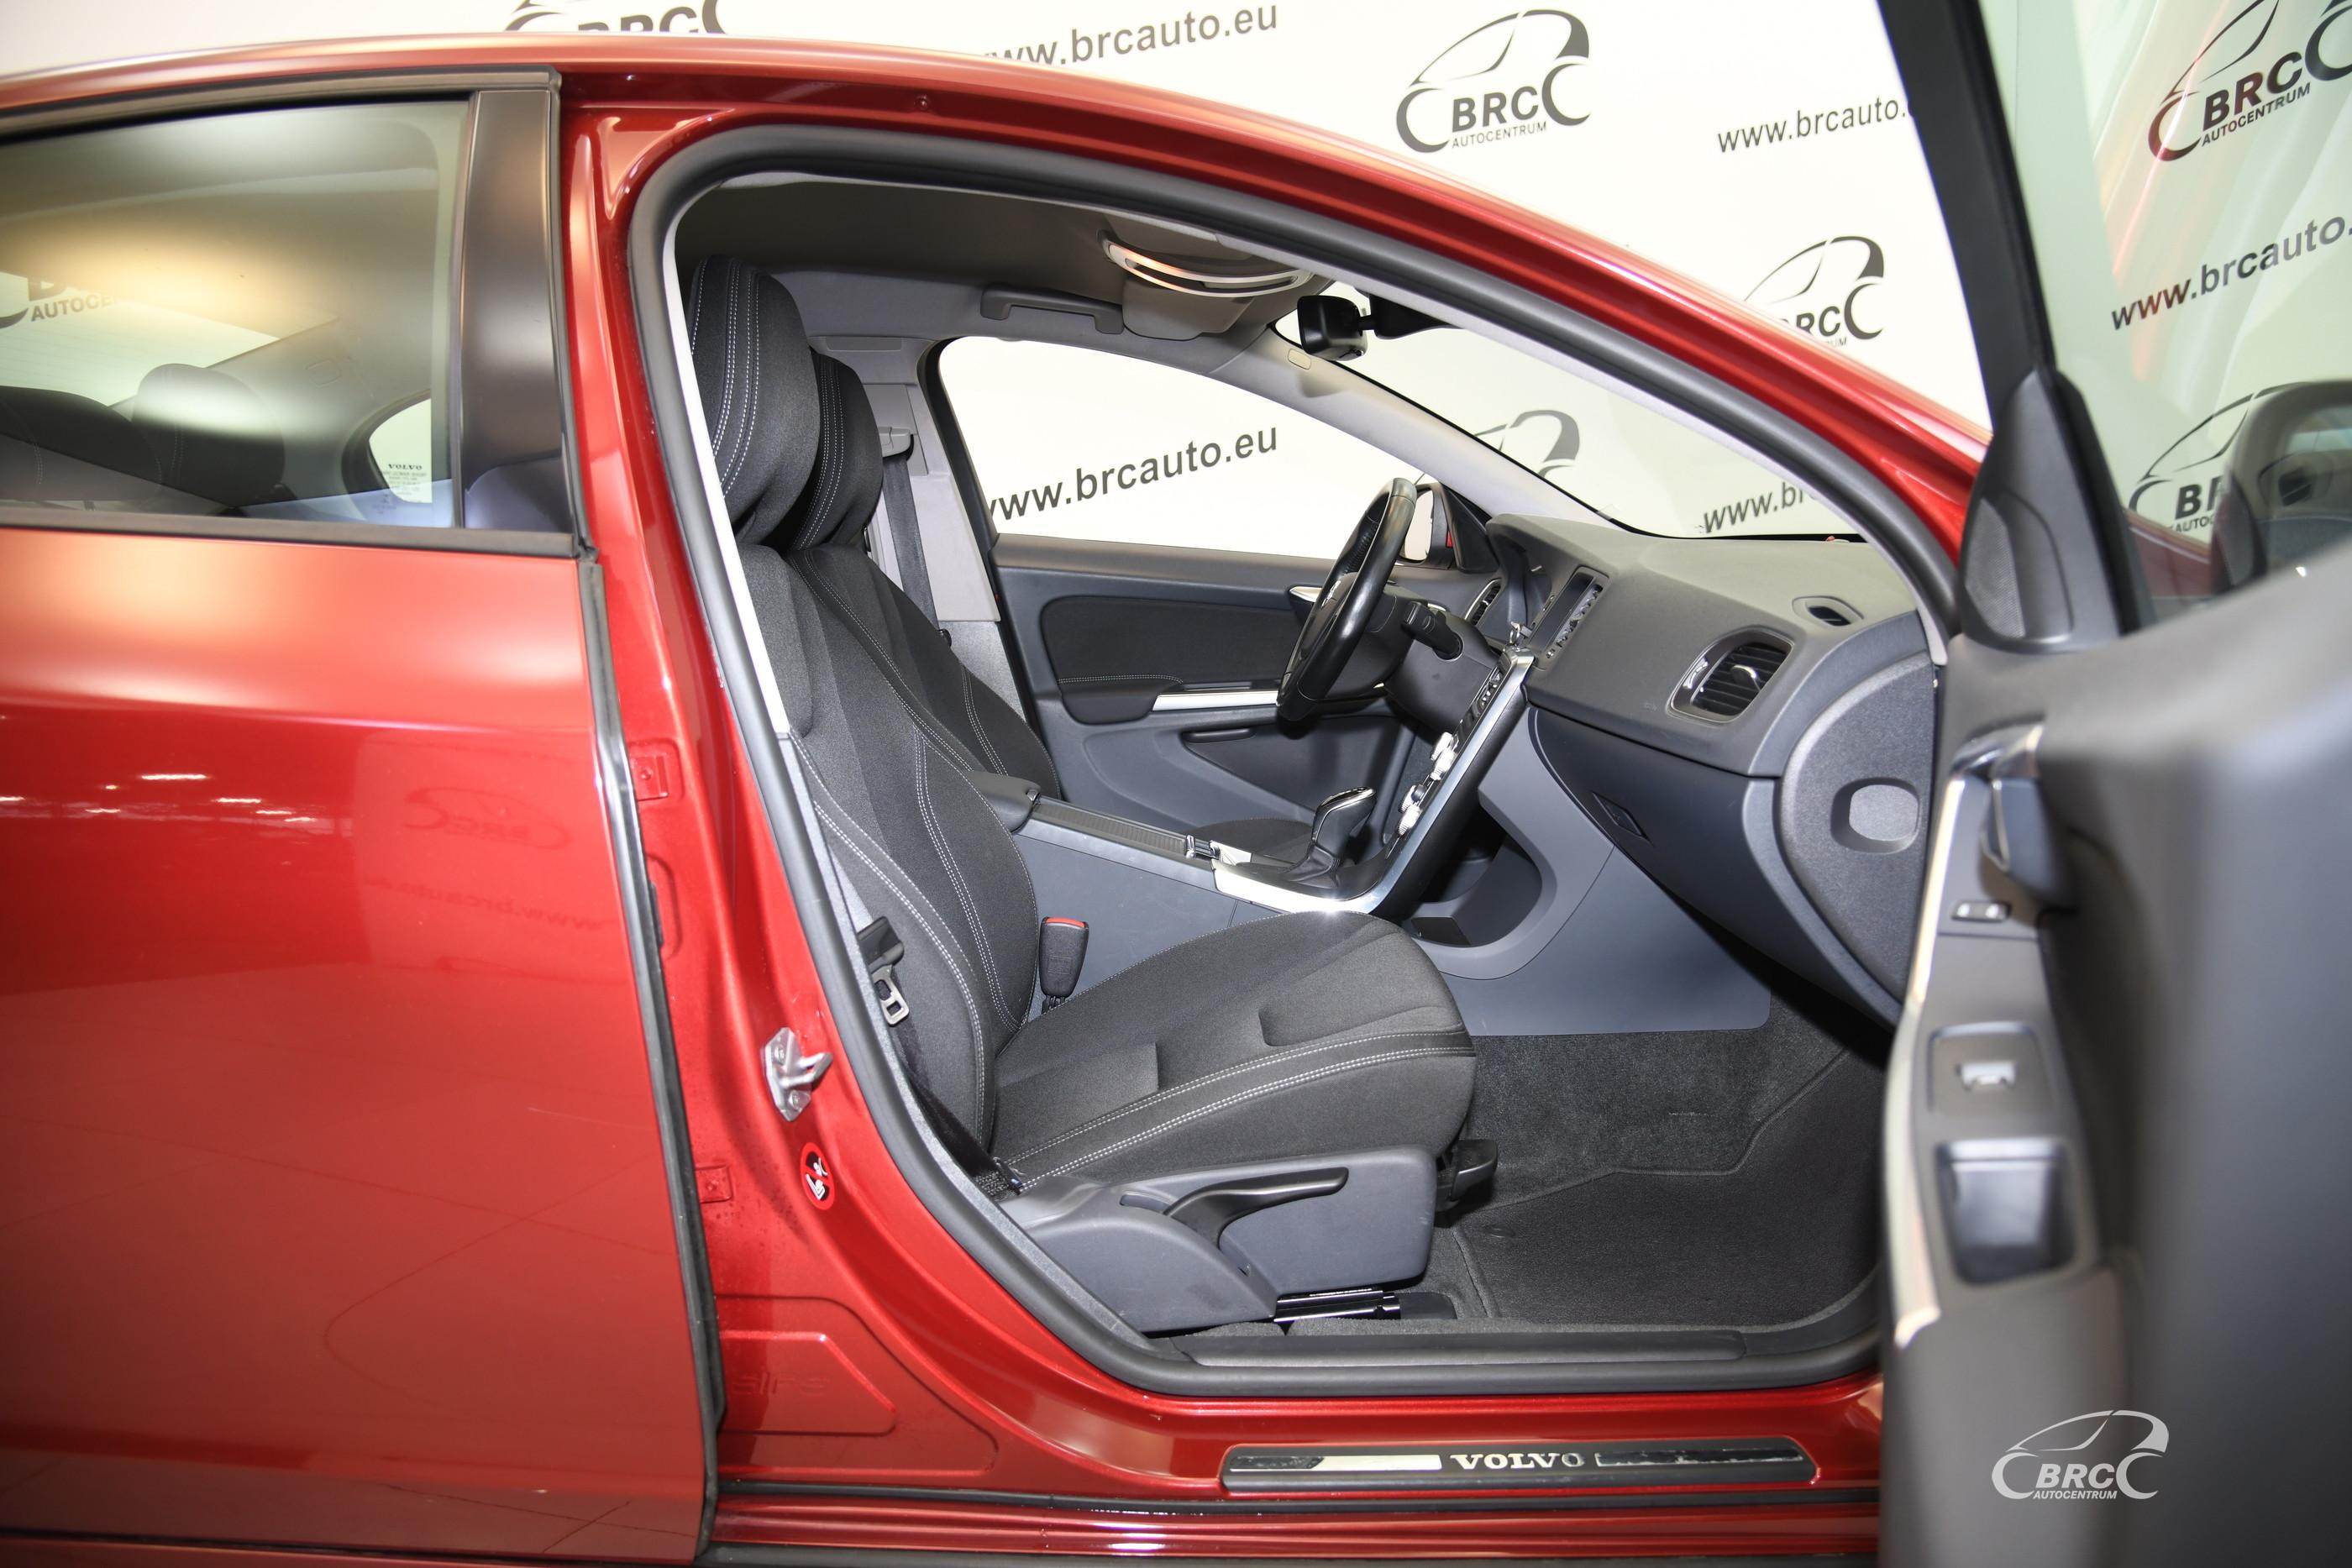 Volvo S60 D3 Automatas